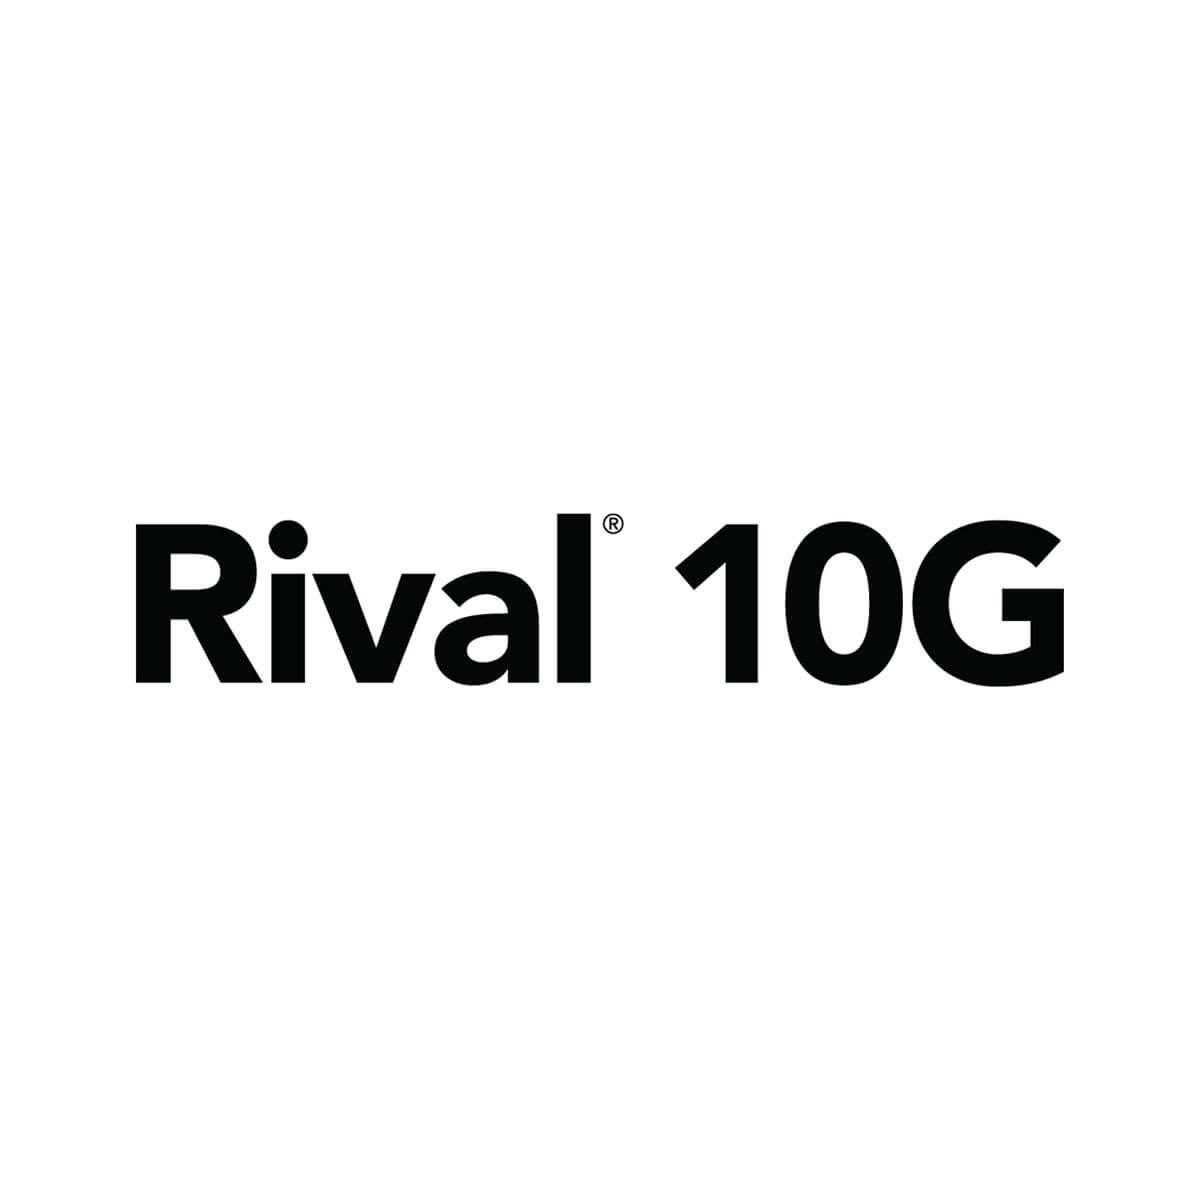 RIVAL 10G 22.7KG